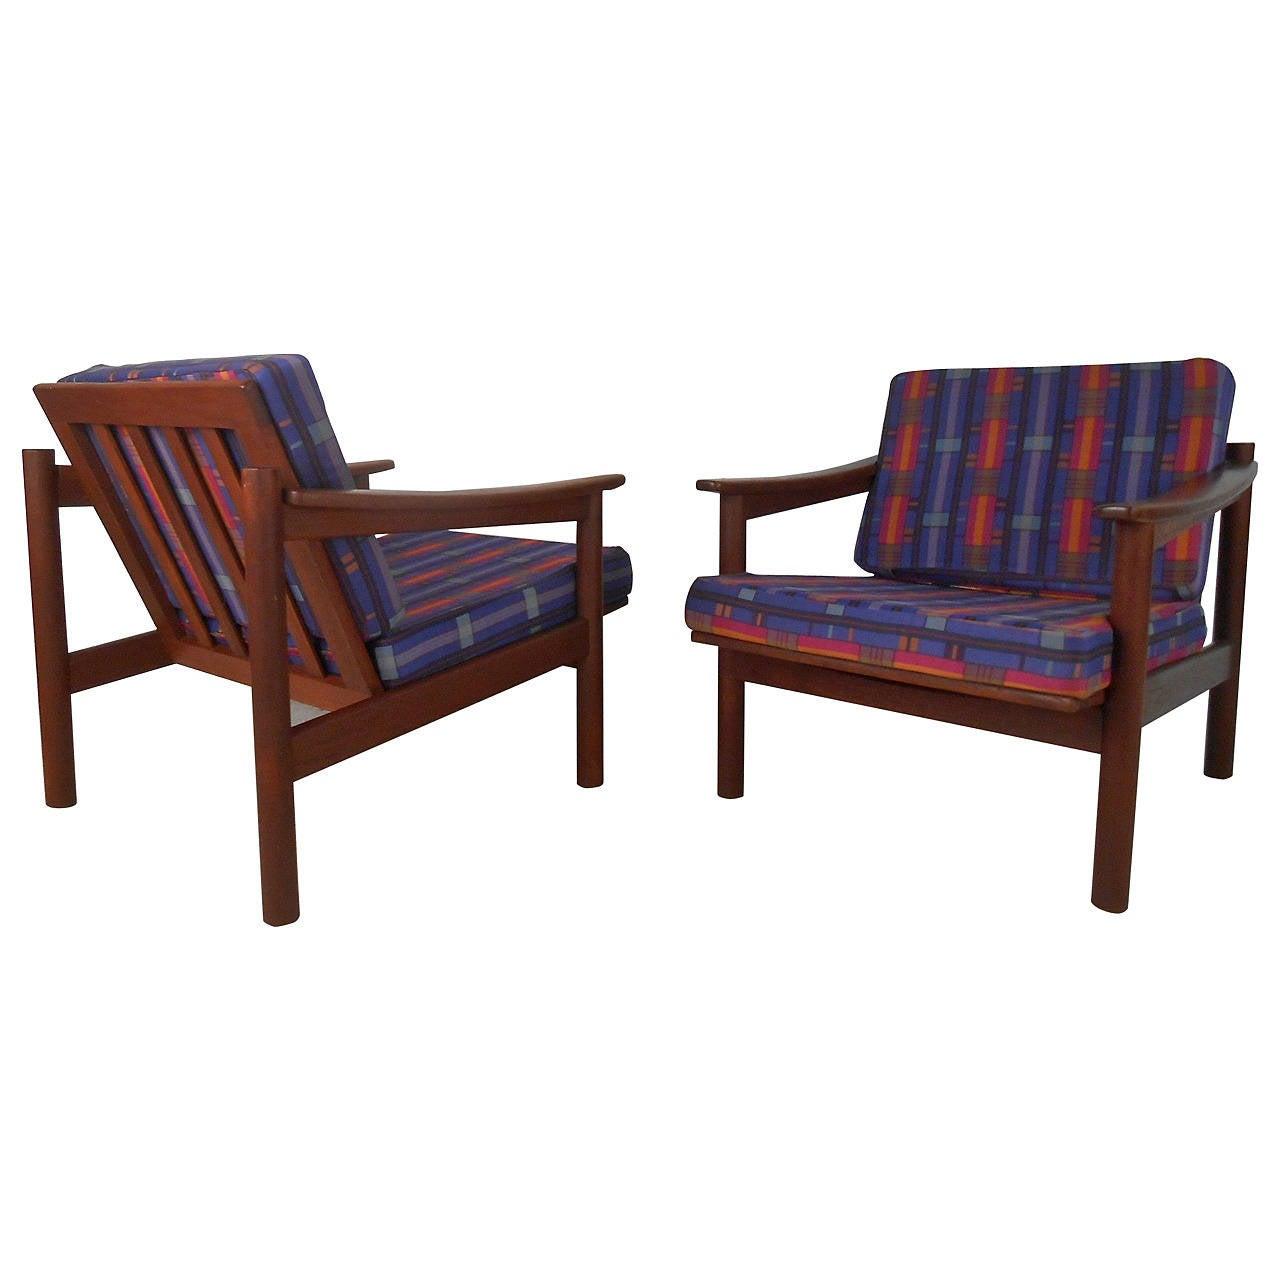 Vintage Danish Lounge Chairs